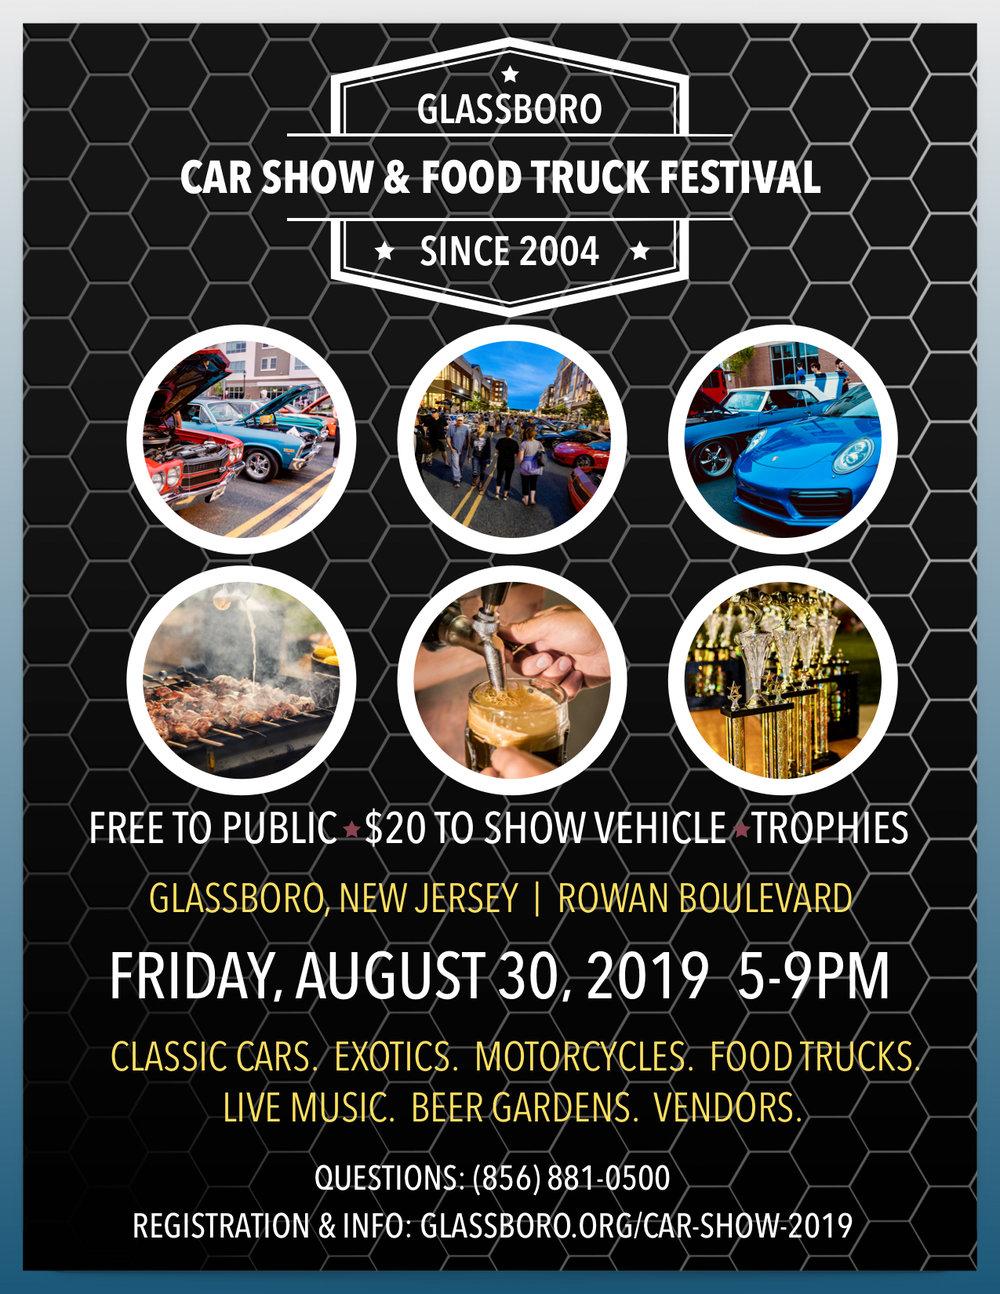 2019 glassboro car show poster.jpeg